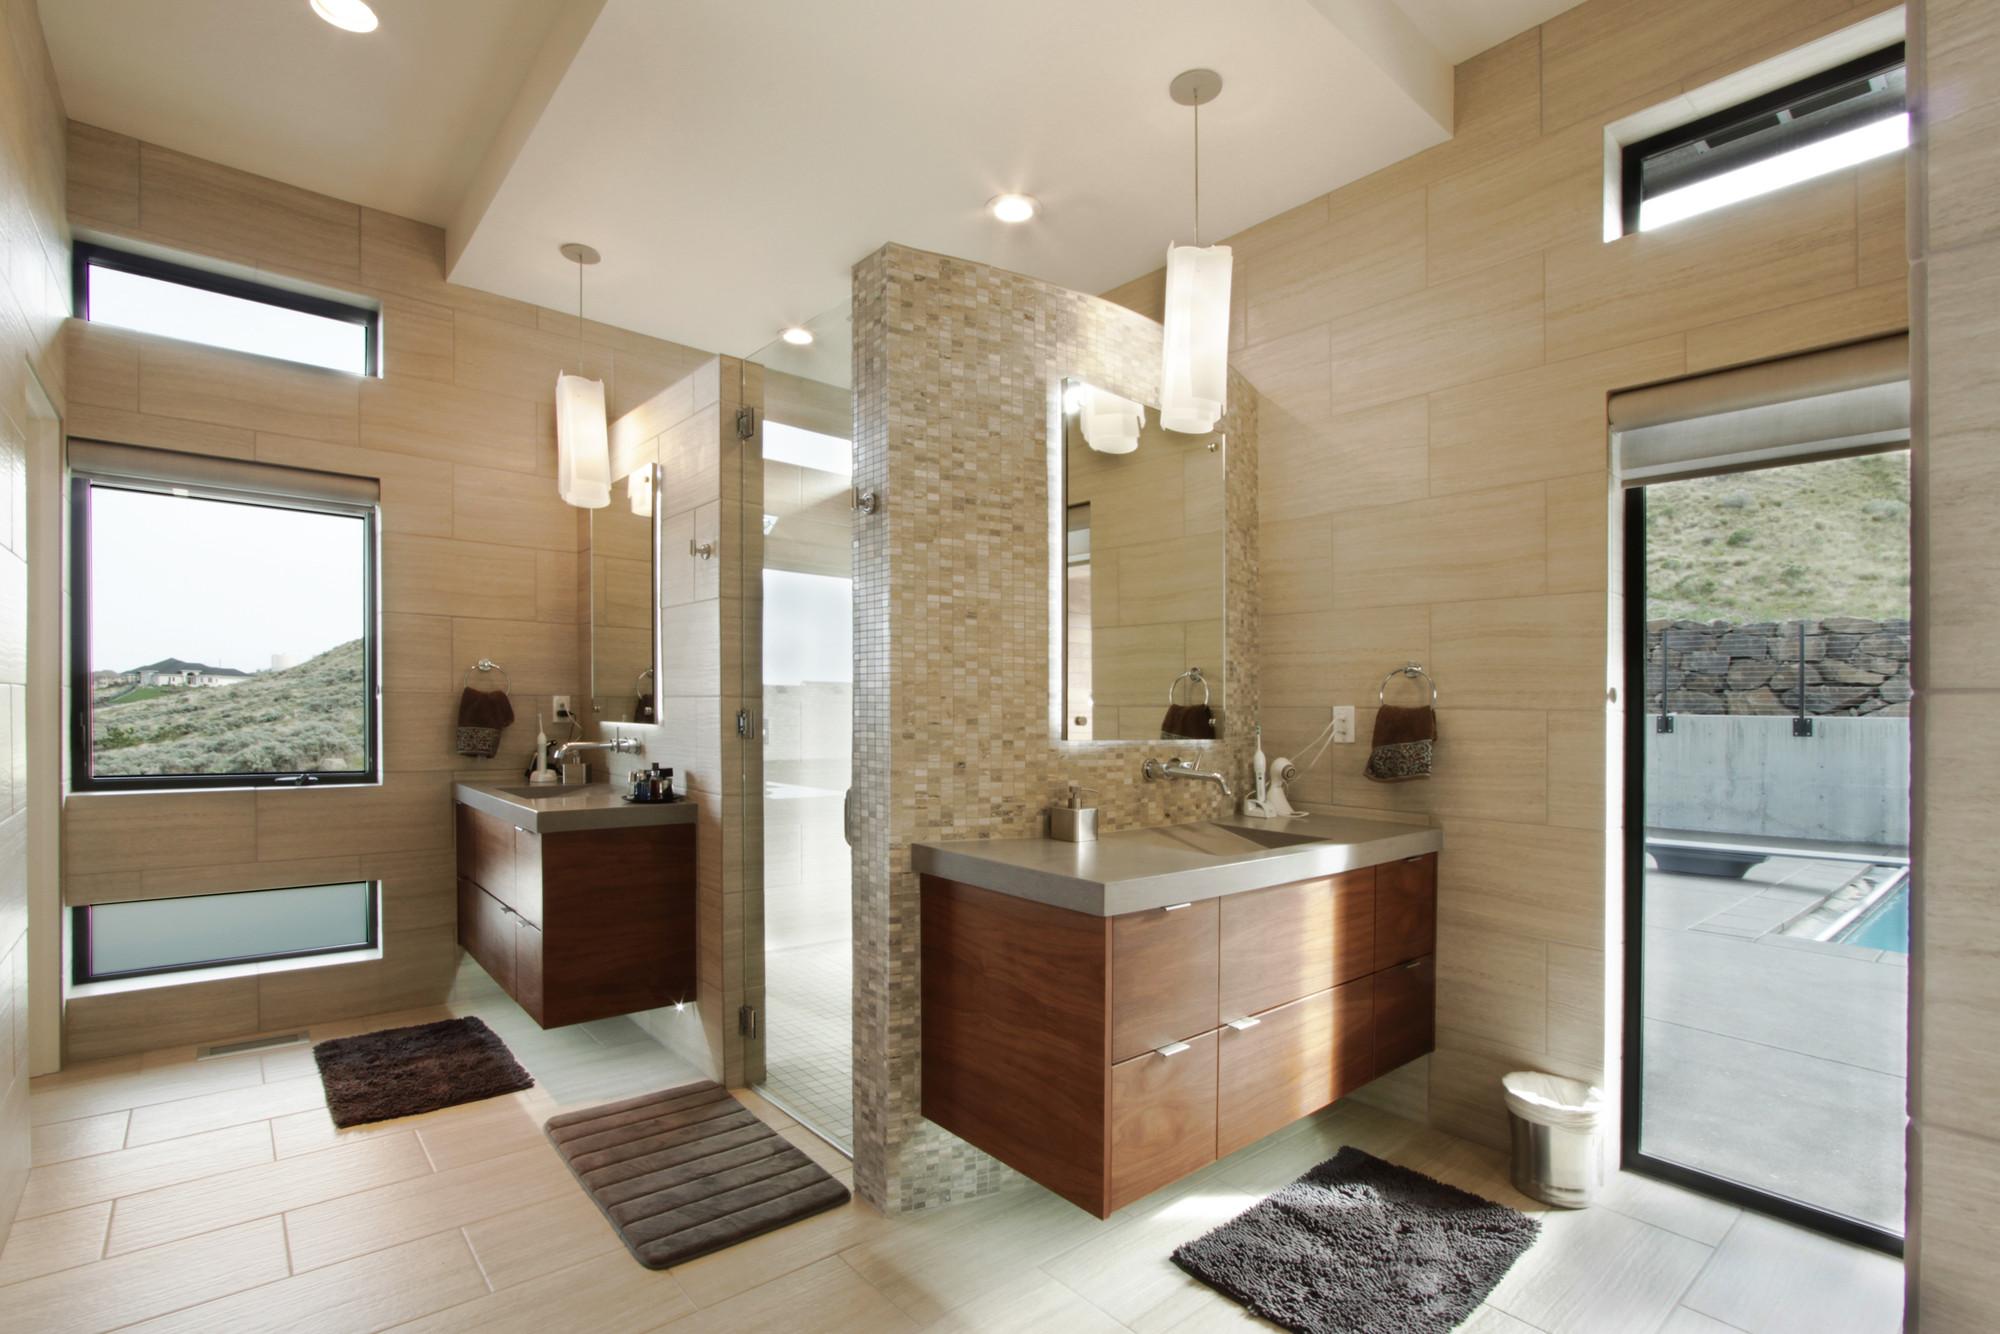 Galeria de casa na montanha badger first lamp for W 4 bathrooms chiswick